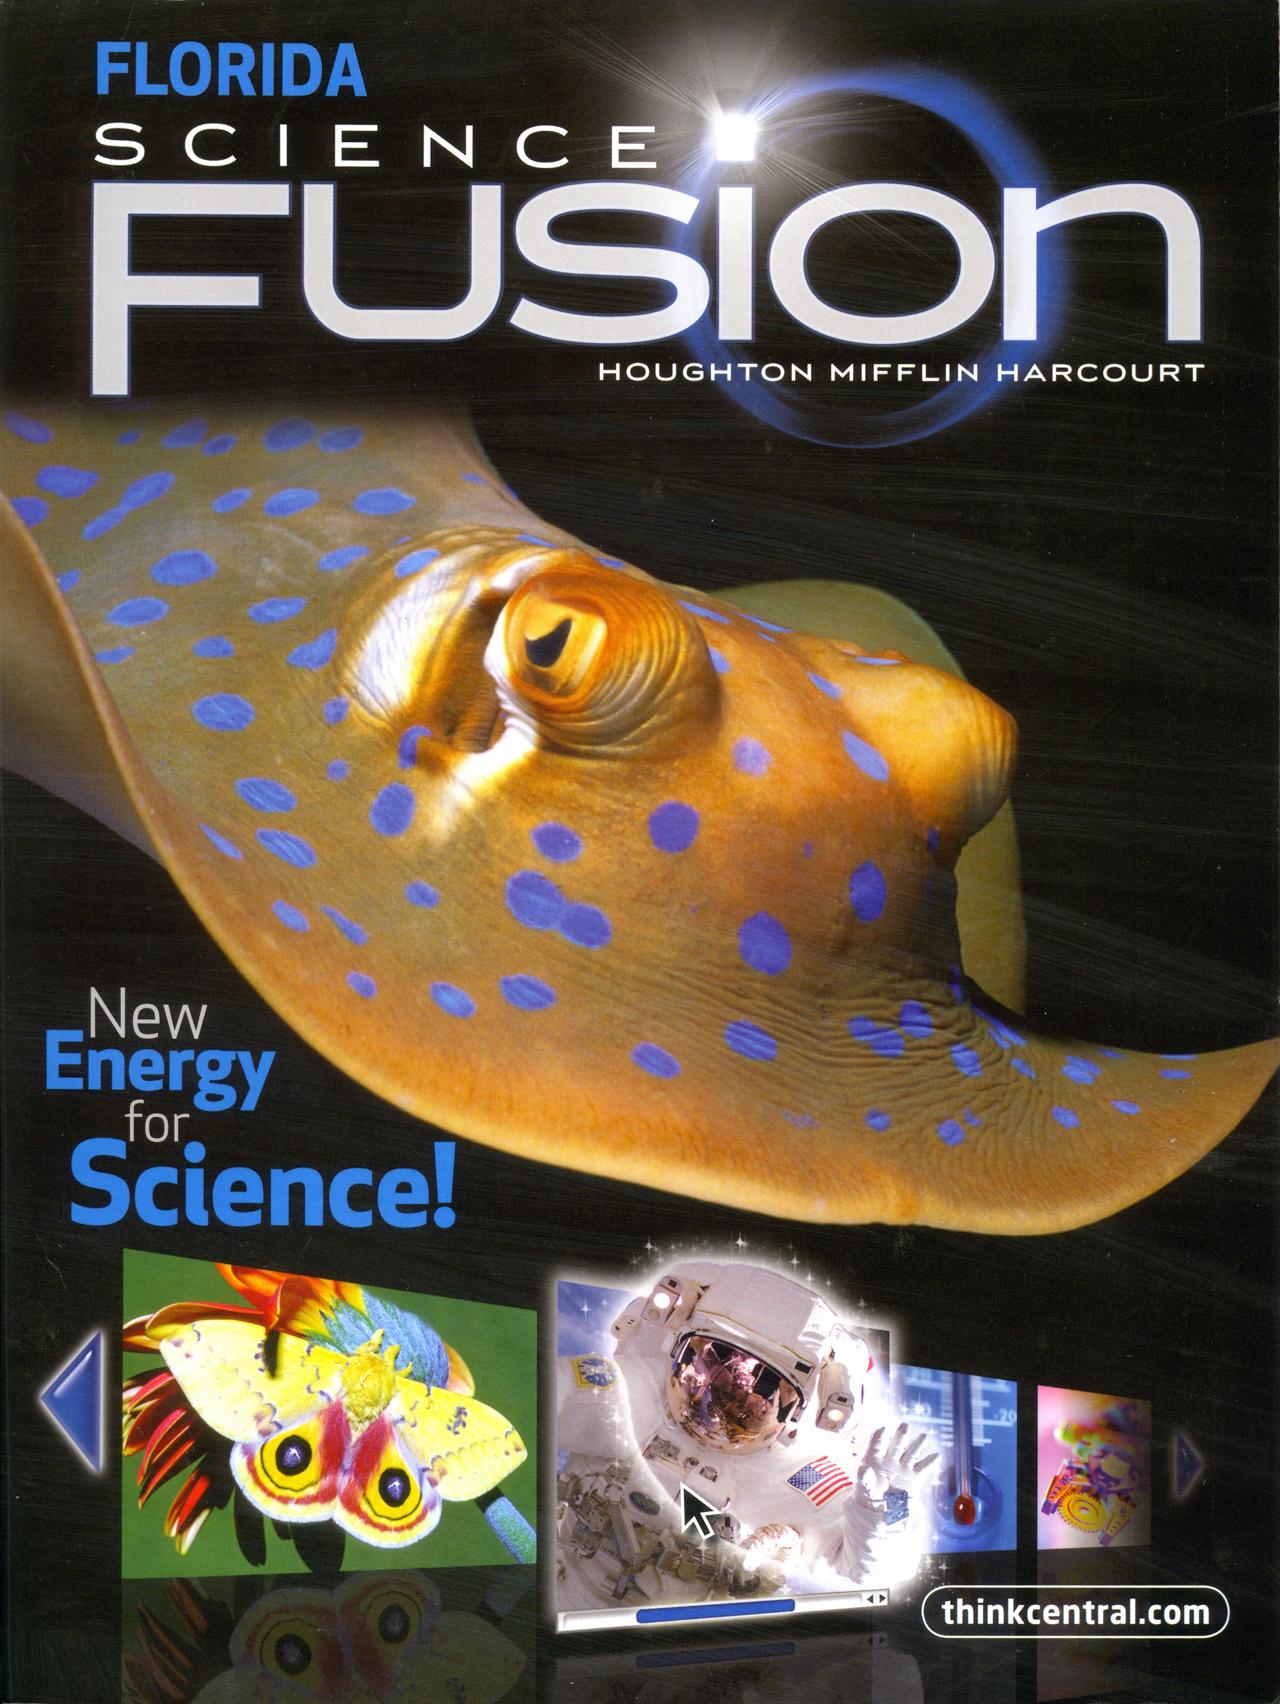 fusion science grade sciencefusion textbooks houghton homeschool florida student worktext interactive harcourt edition mifflin hmh unit elementary energy grades level